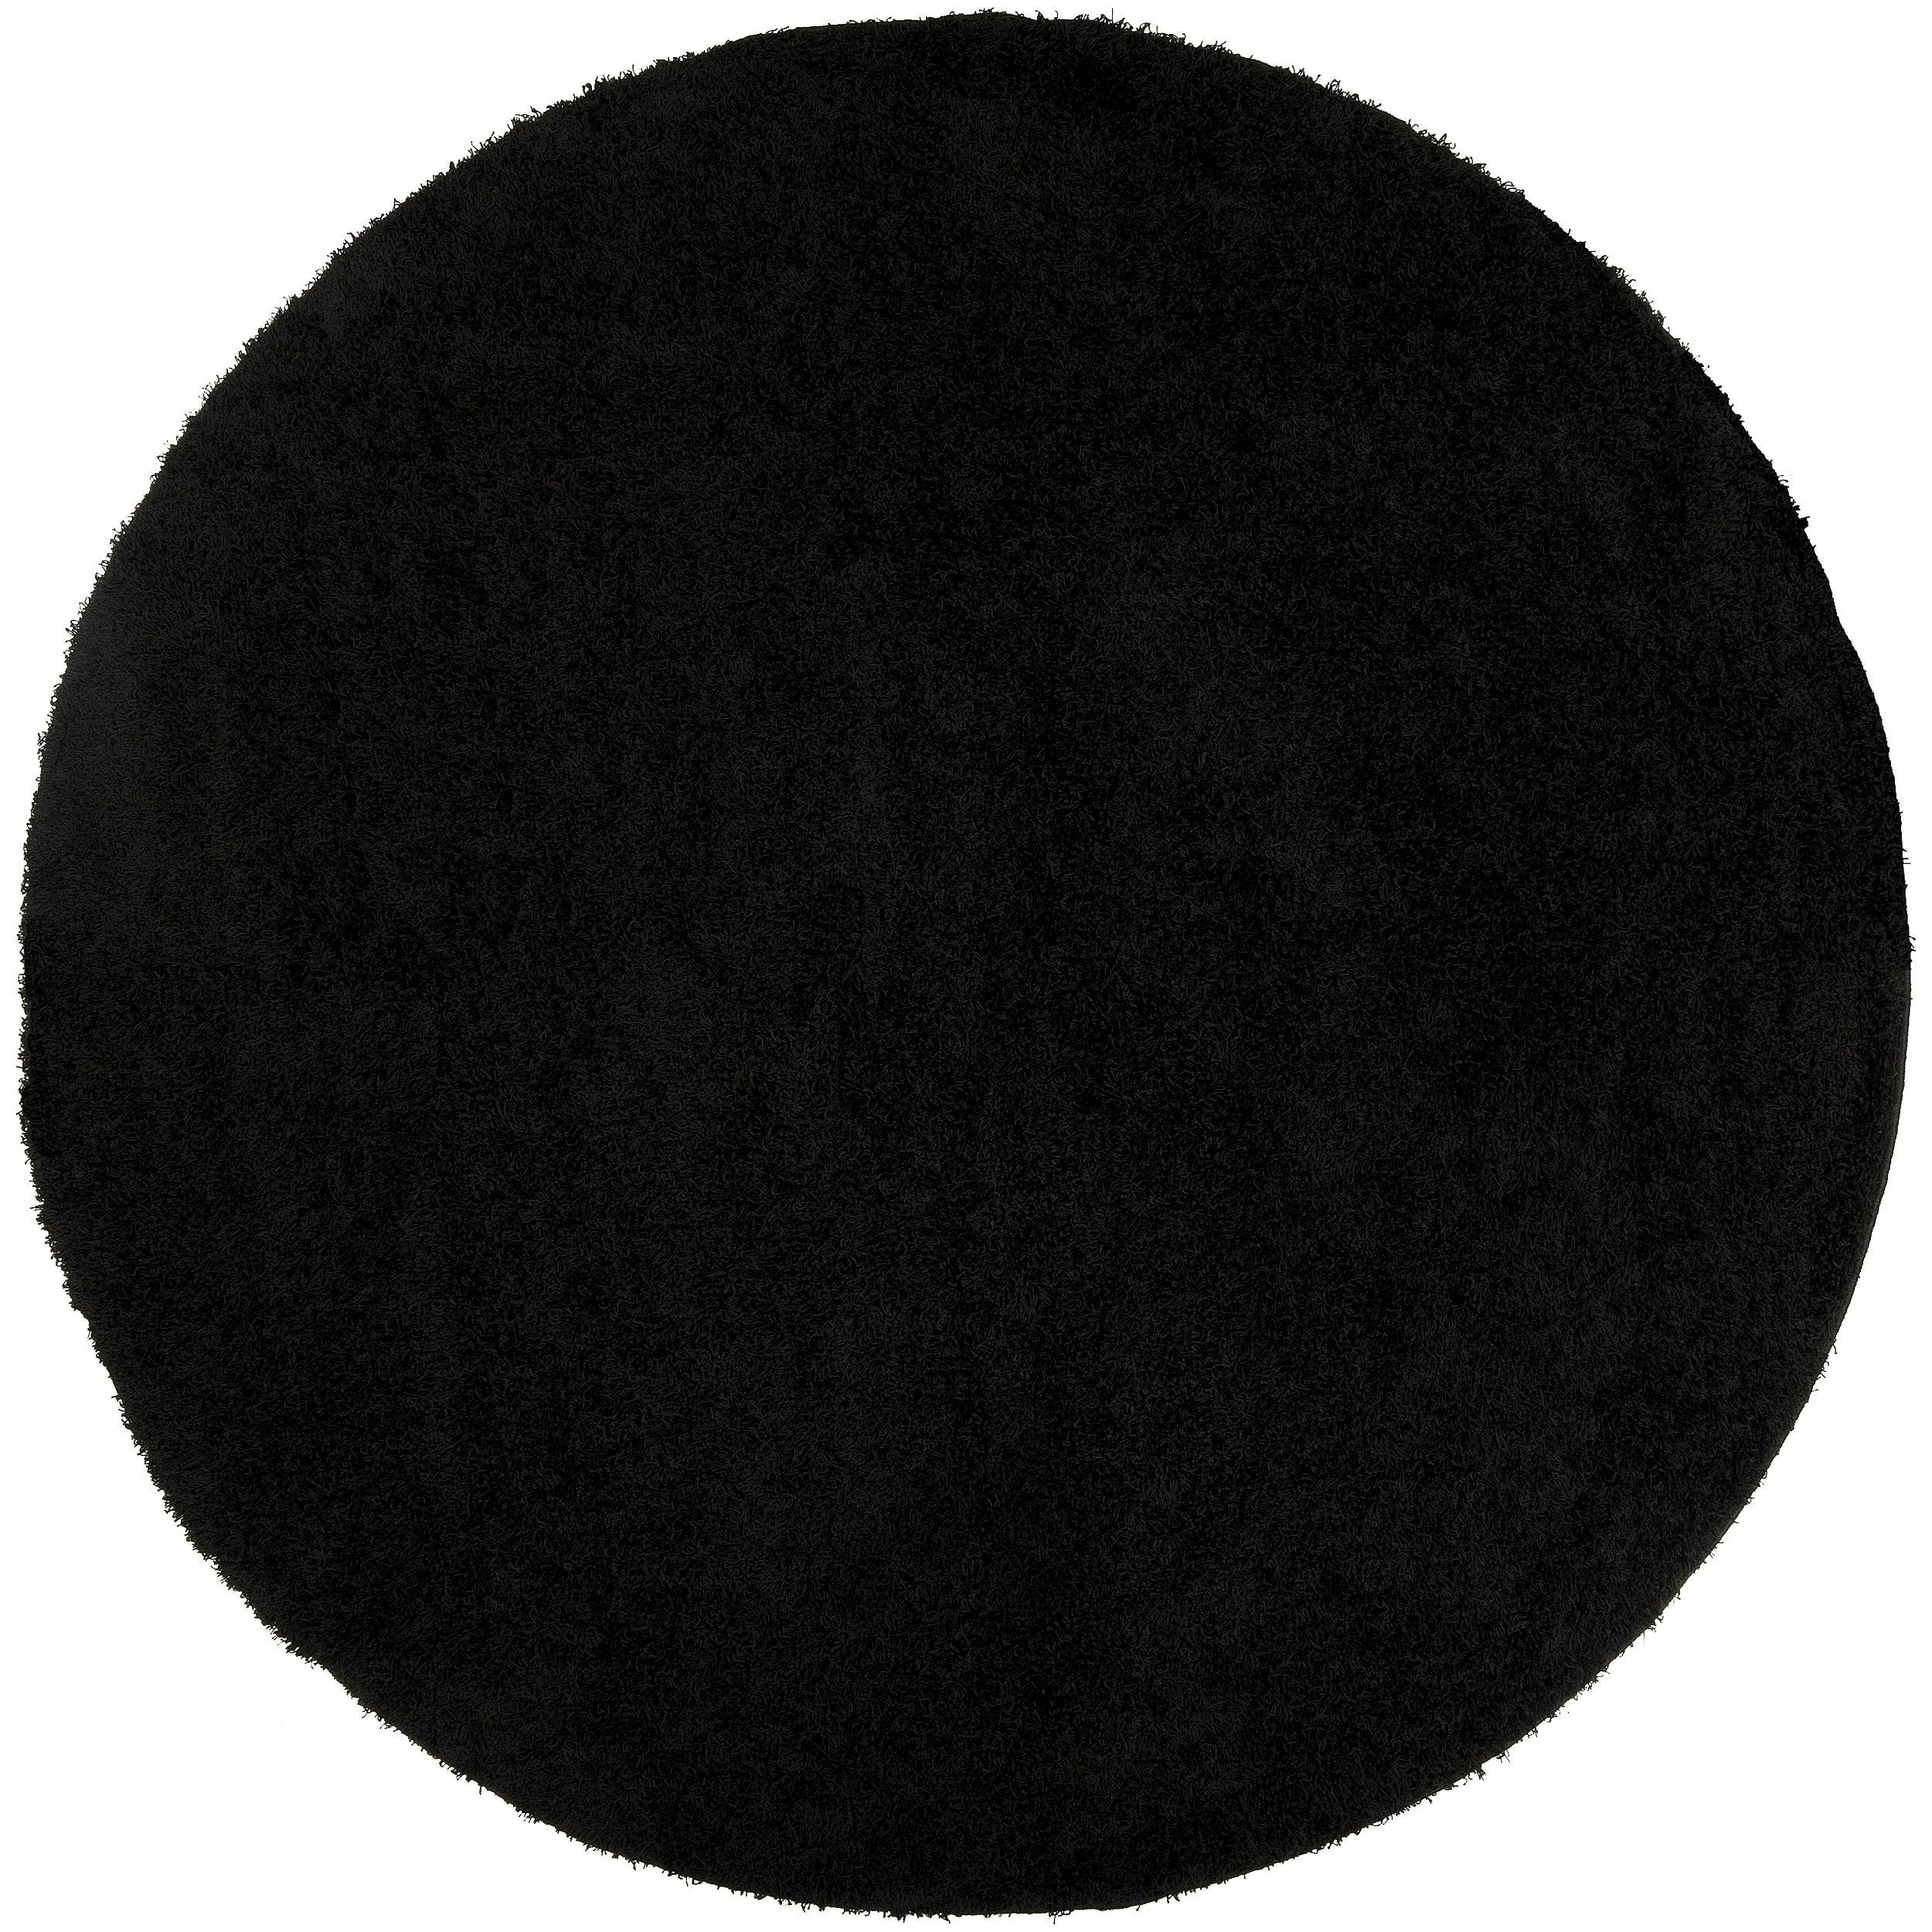 Woven Black Spini Plush Shag (4' Round)